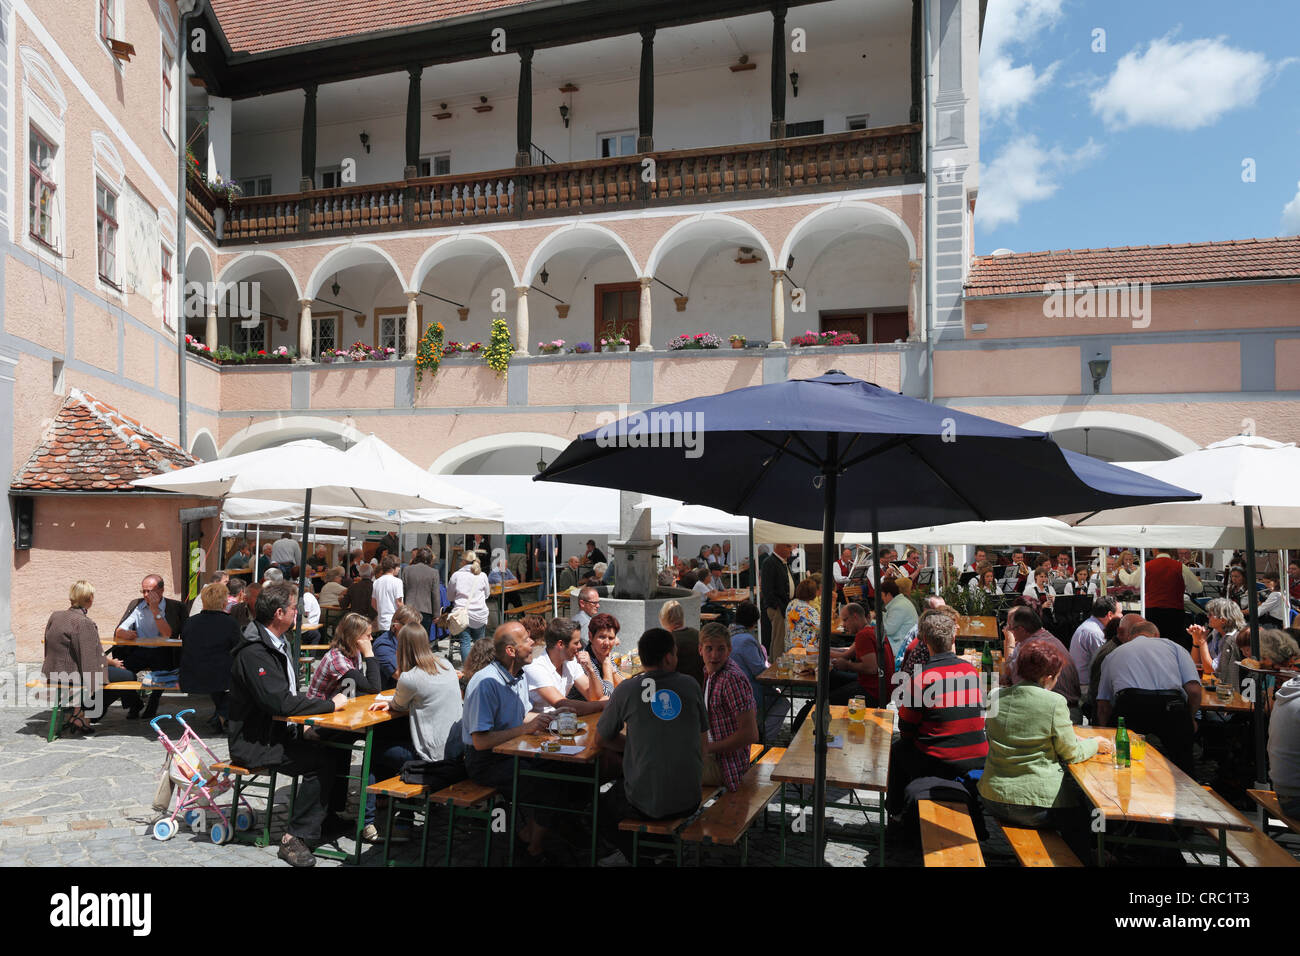 Festival de música en el patio del castillo Schloss Rossatz Wachau, Baja Austria, Austria, Europa Imagen De Stock